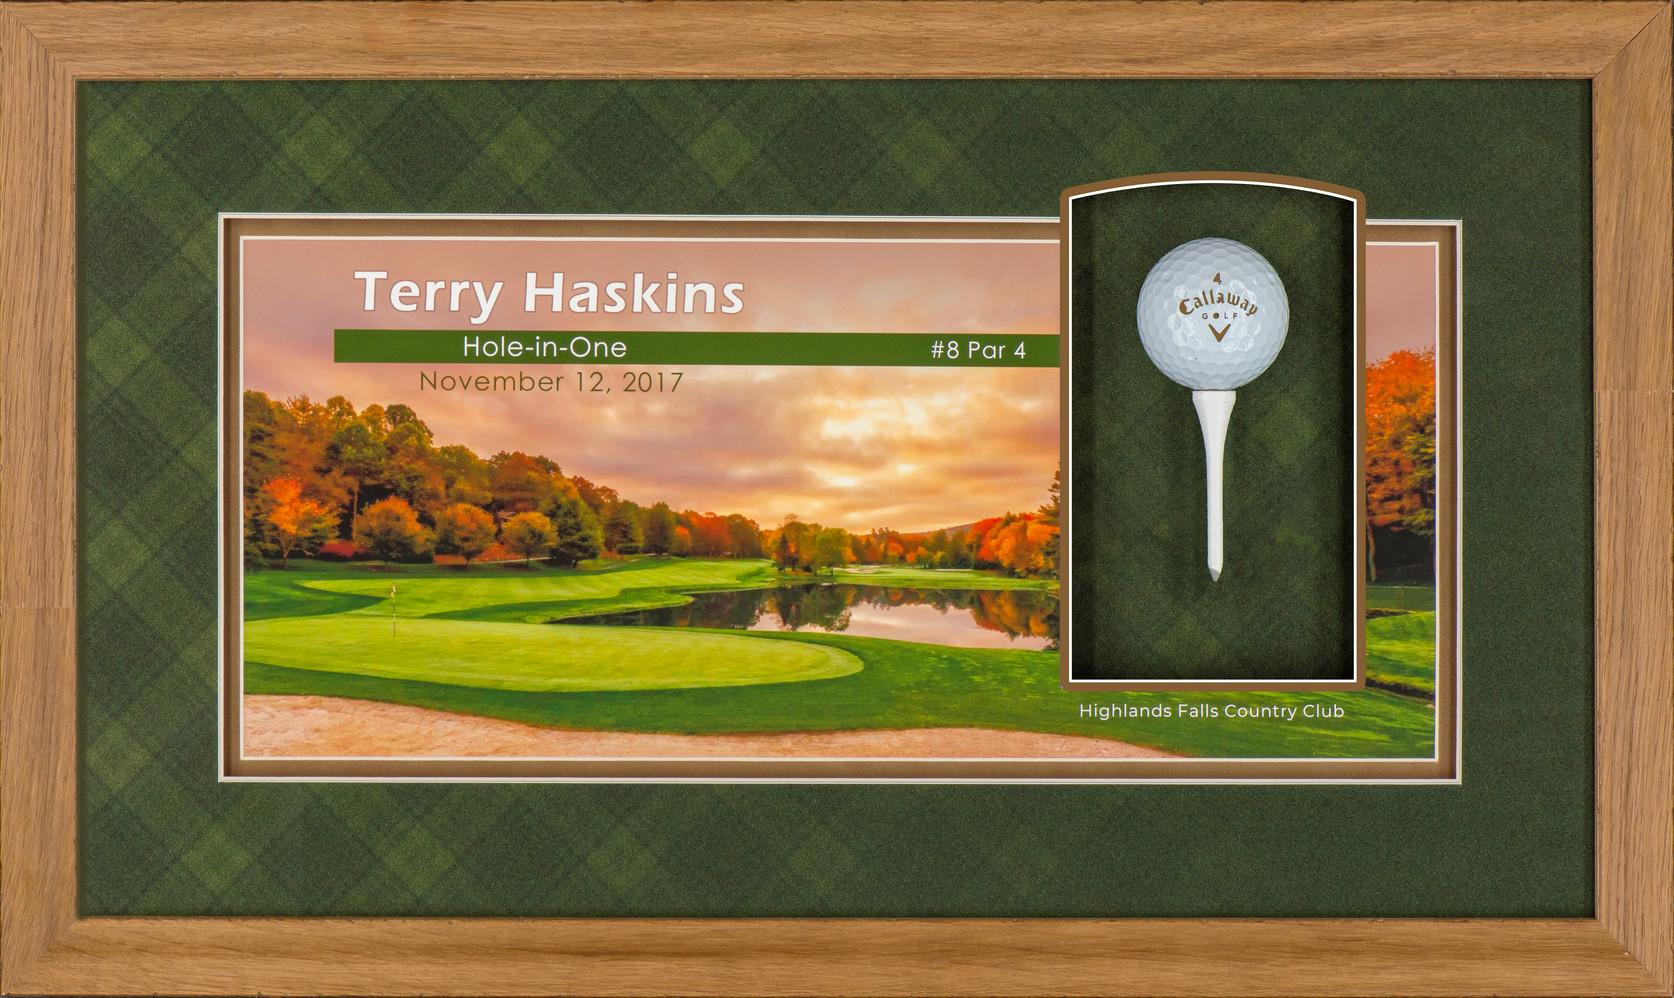 Hole-in-One Framed Golf Ball